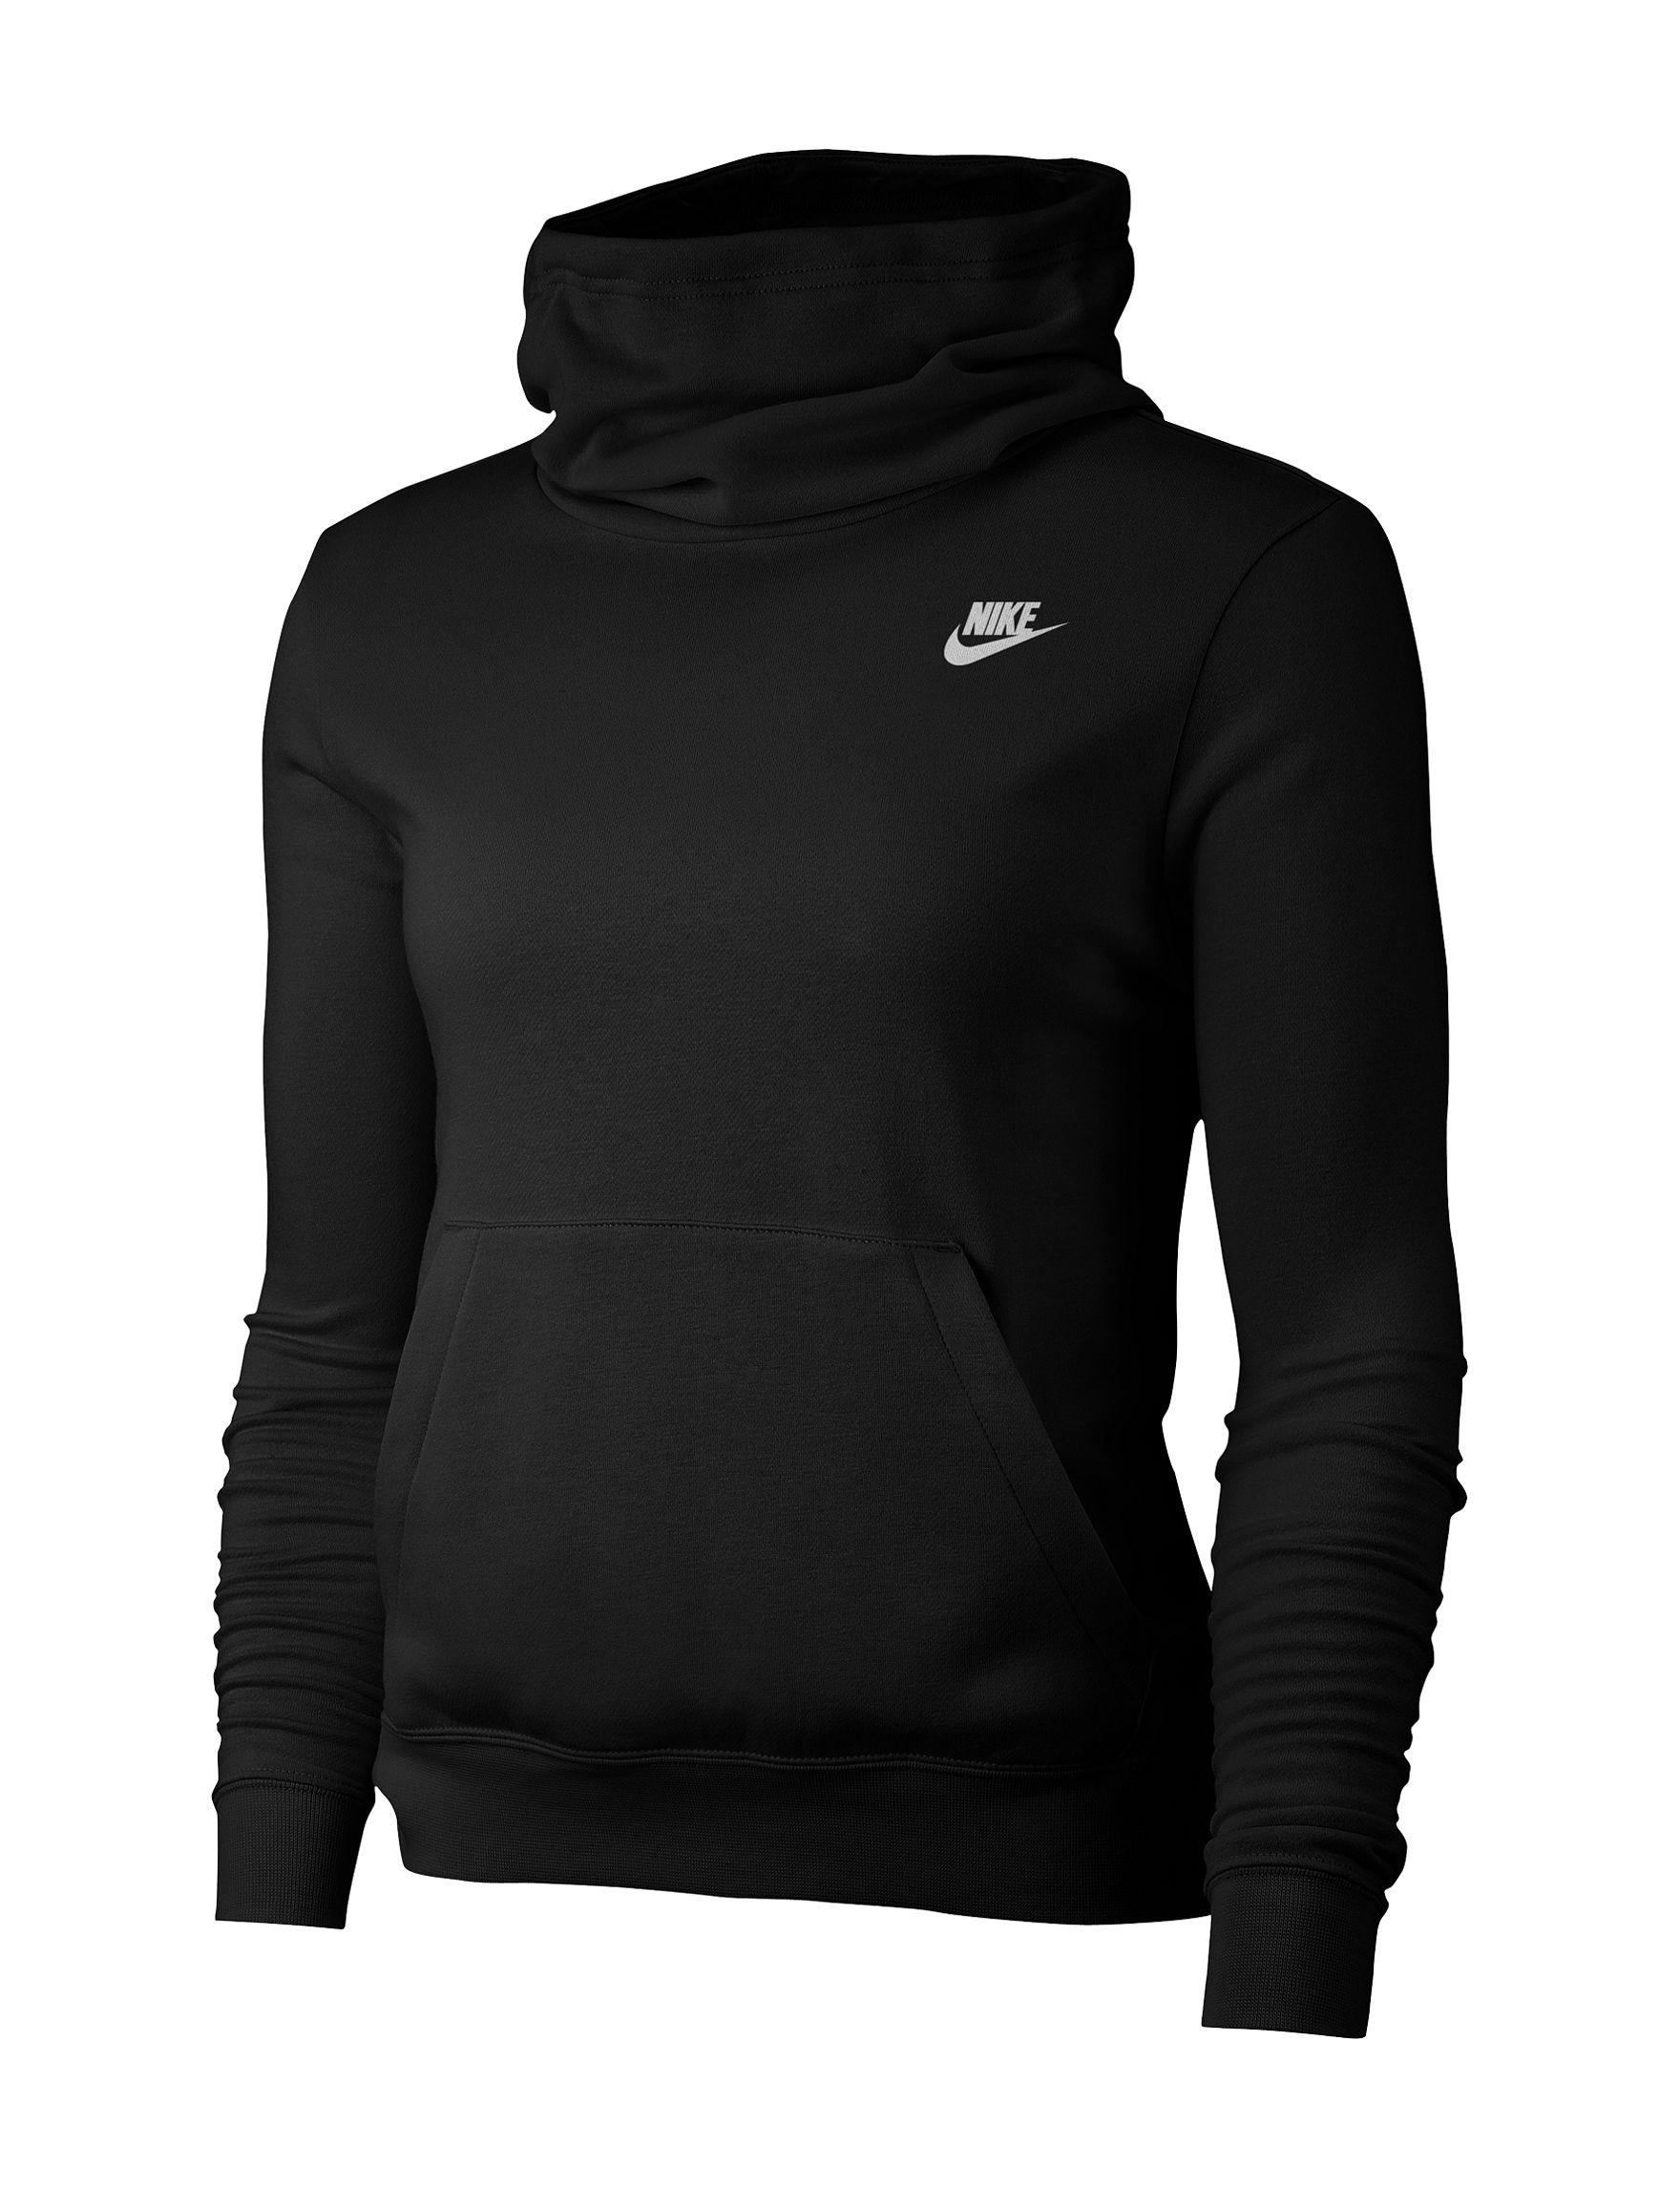 Nike Black Active